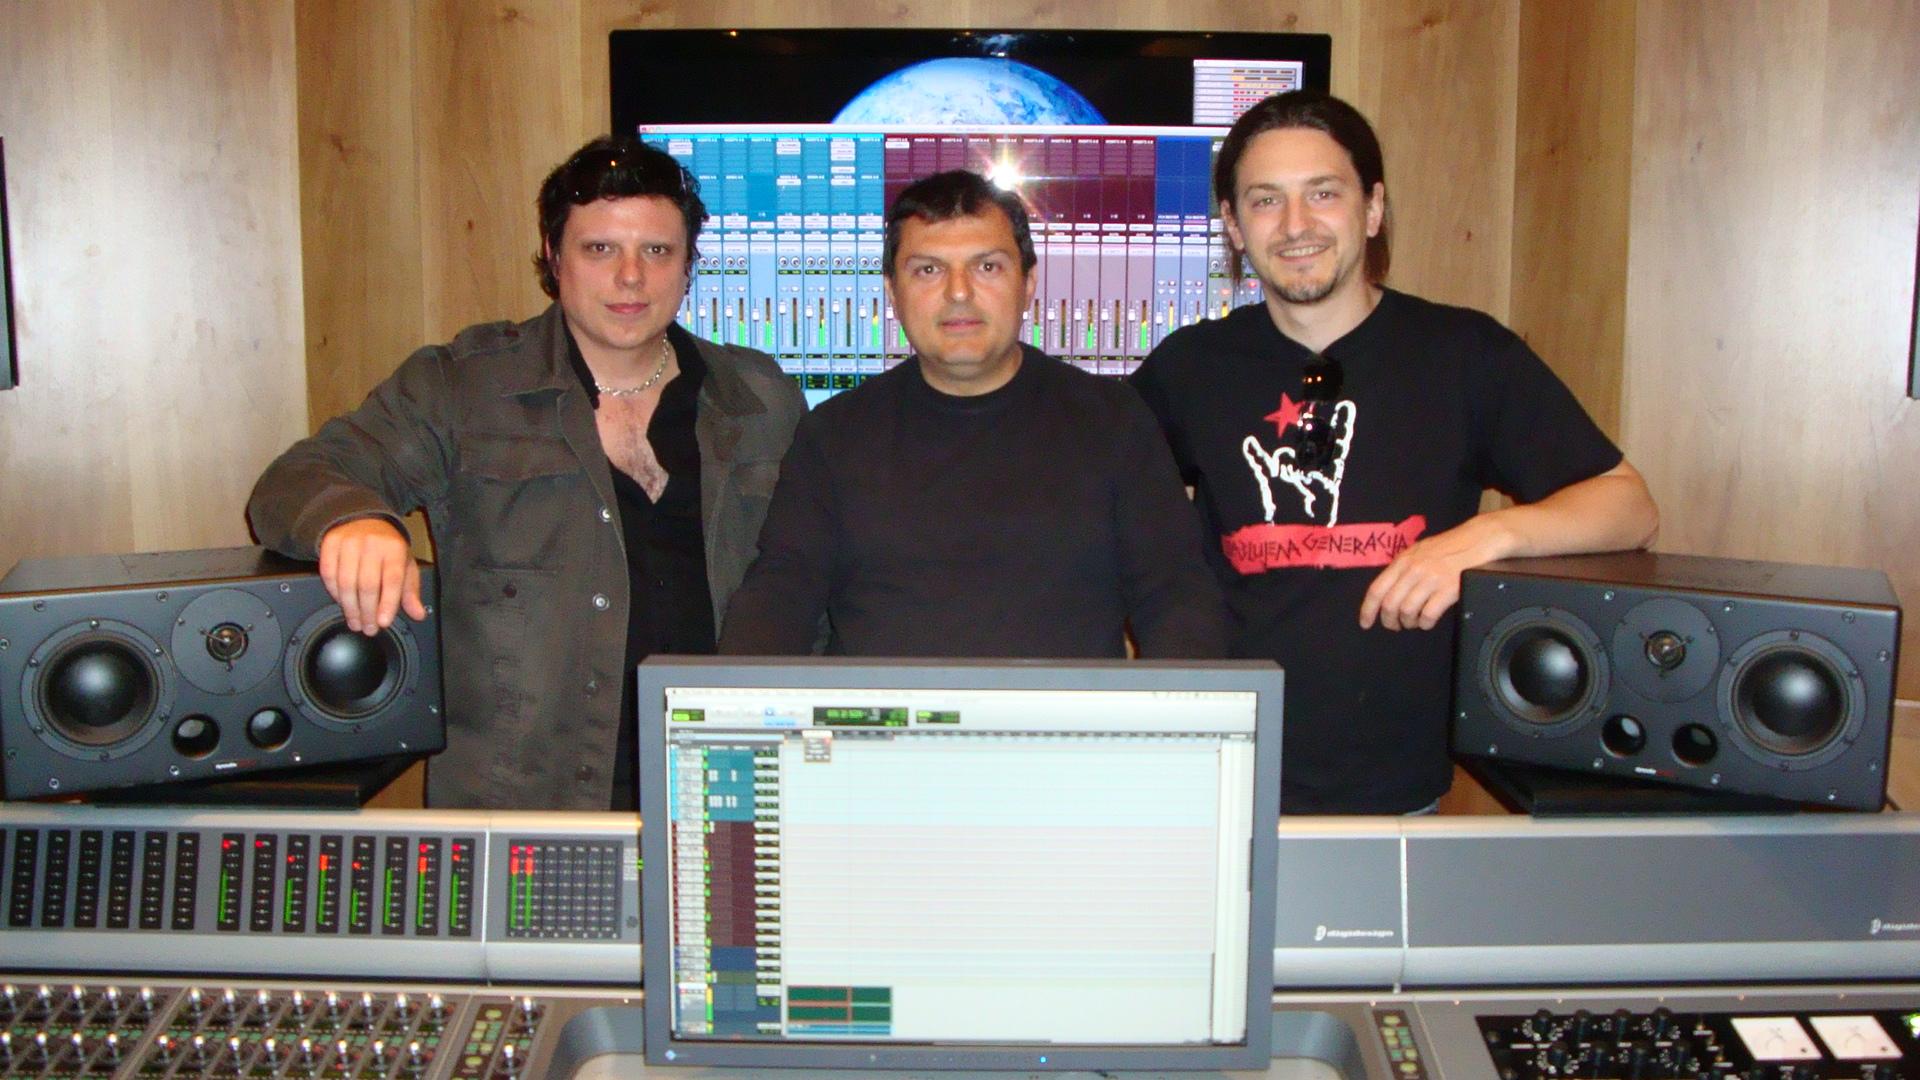 w. pino Pinaxa and Martin Štibernik